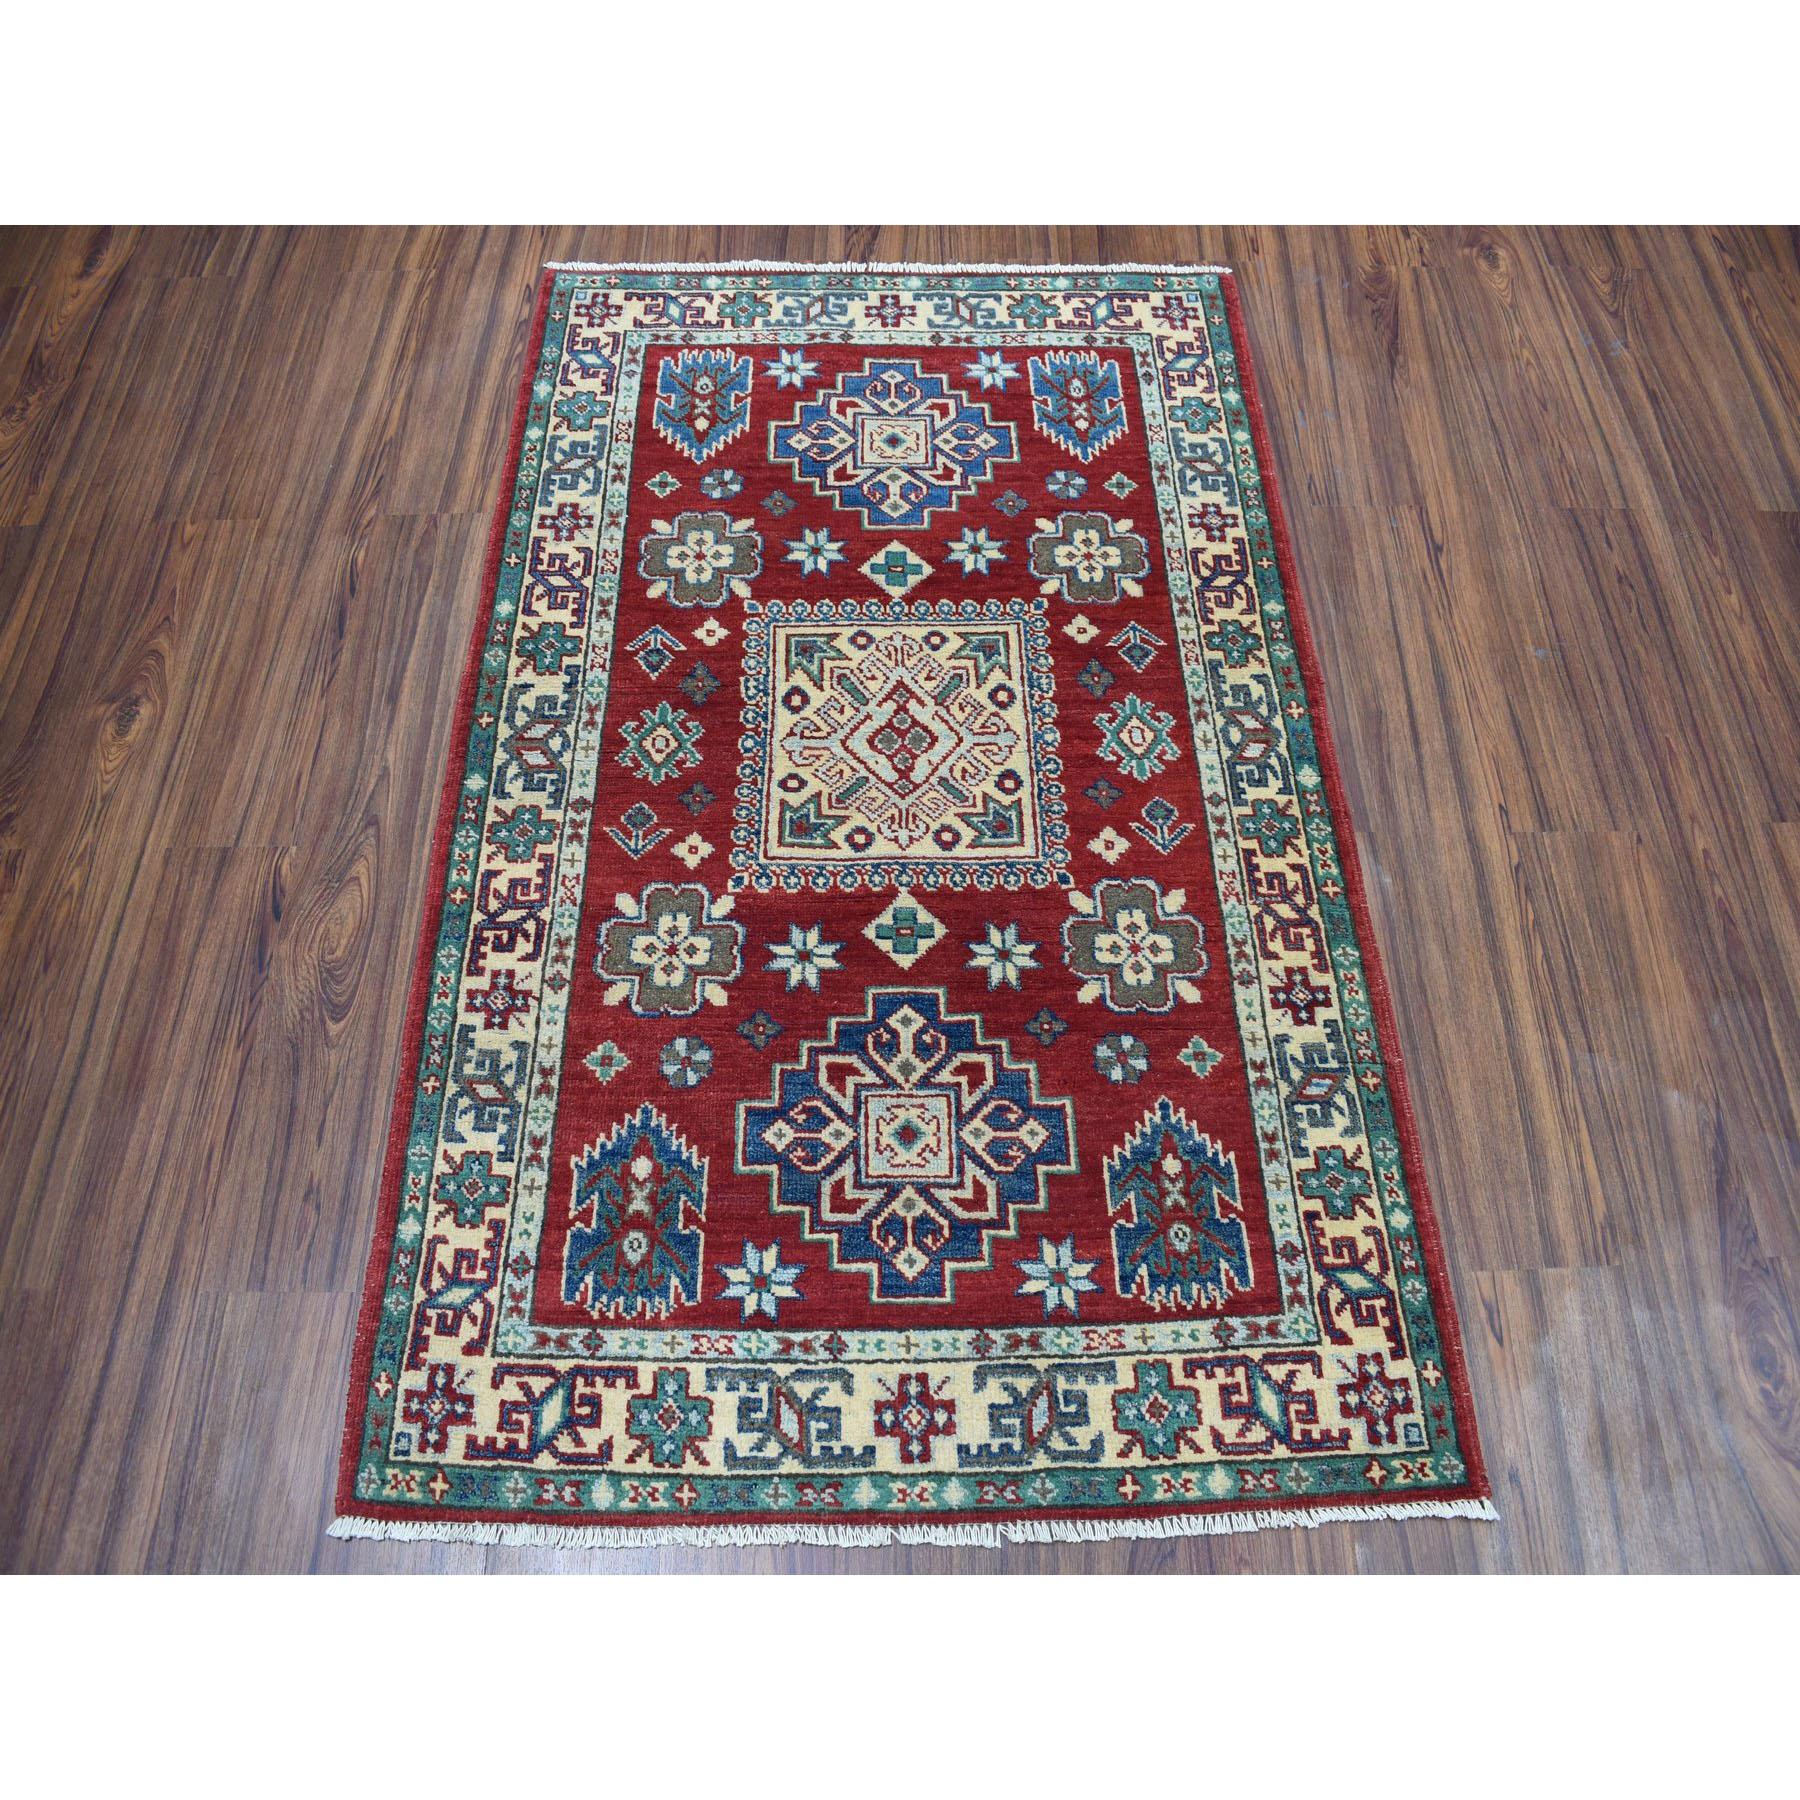 3-4 x5- Red Kazak Pure Wool Geometric Design Hand-Knotted Oriental Rug